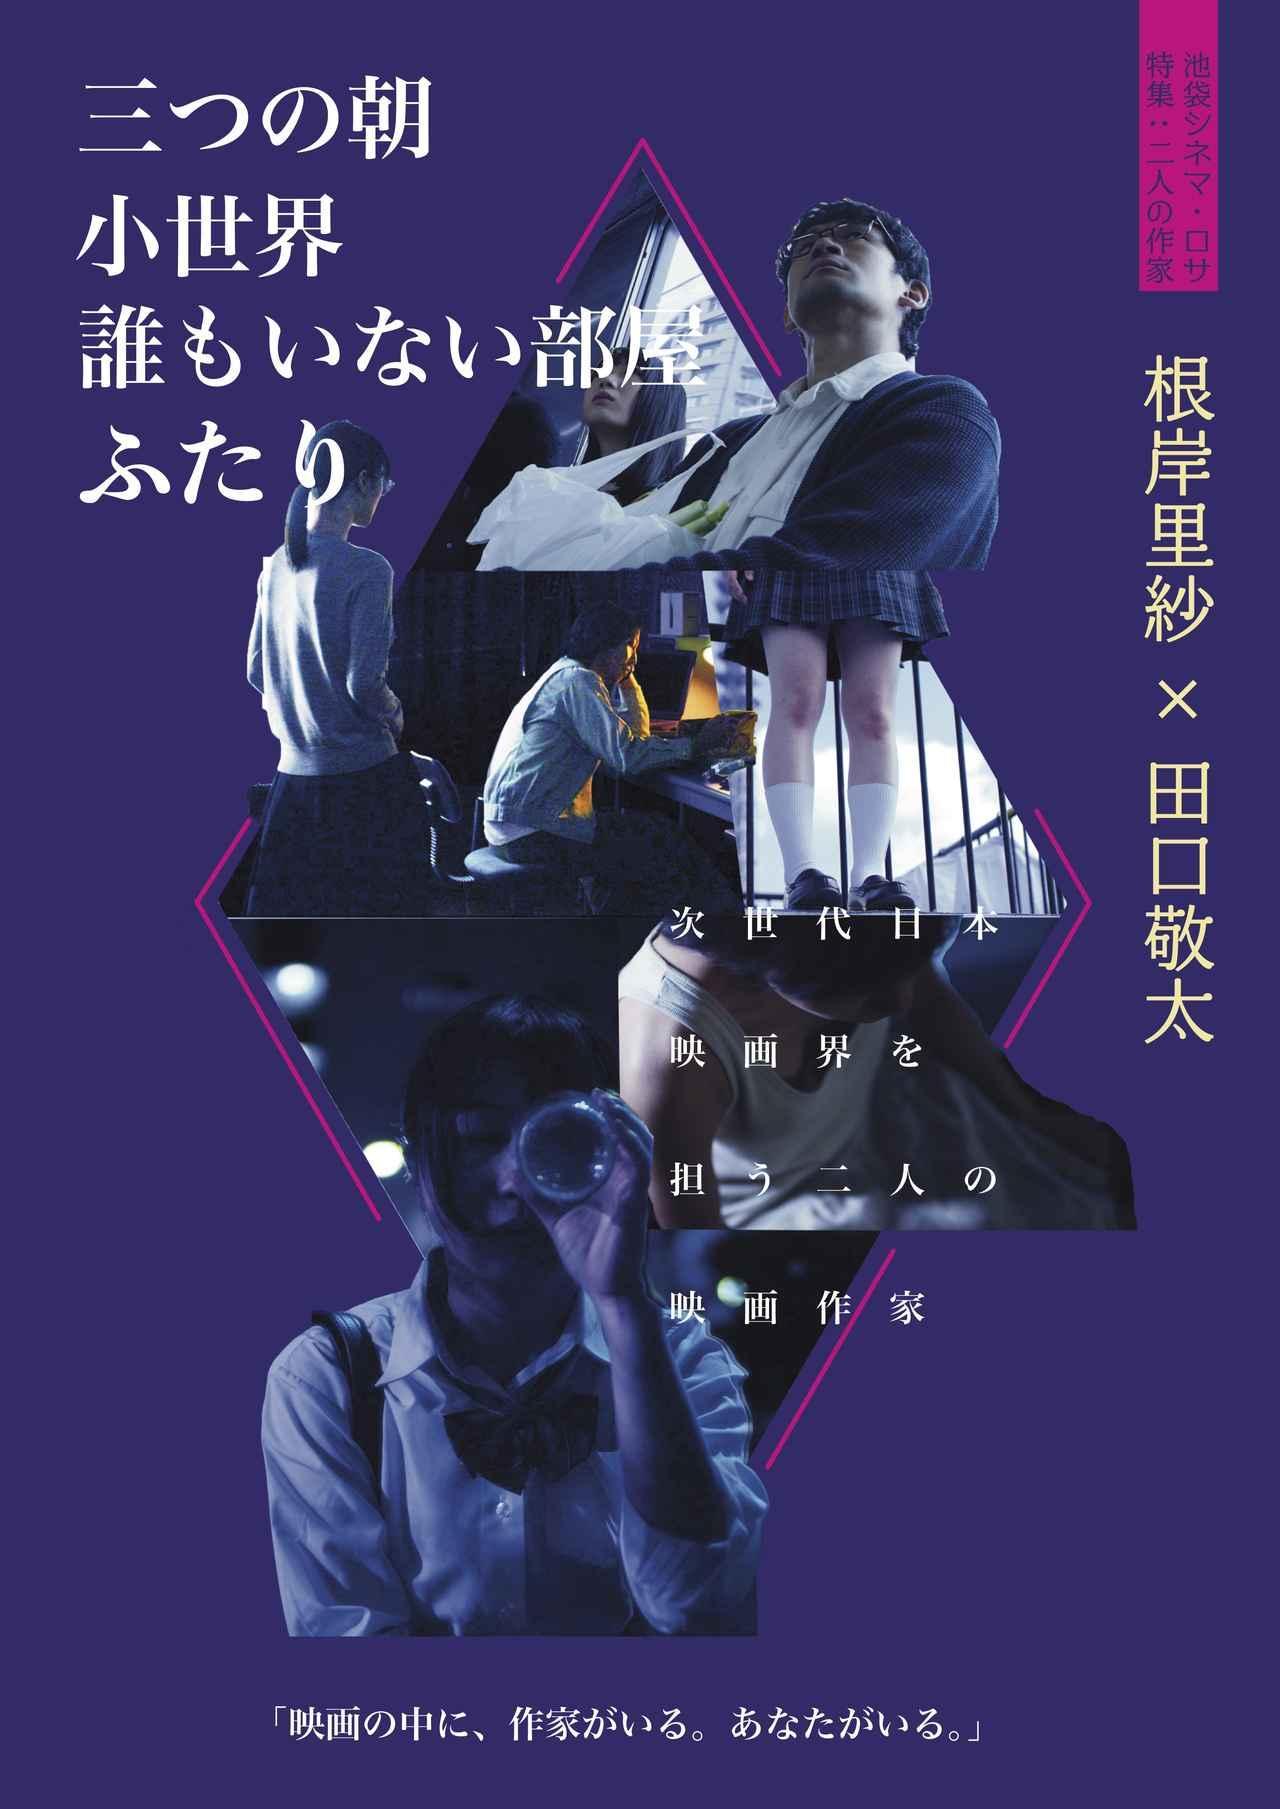 画像: 次世代日本映画界-新進気鋭の若手映画作家二人にスポット!『特集:二人の作家<根岸里紗・田口敬太>』開催!